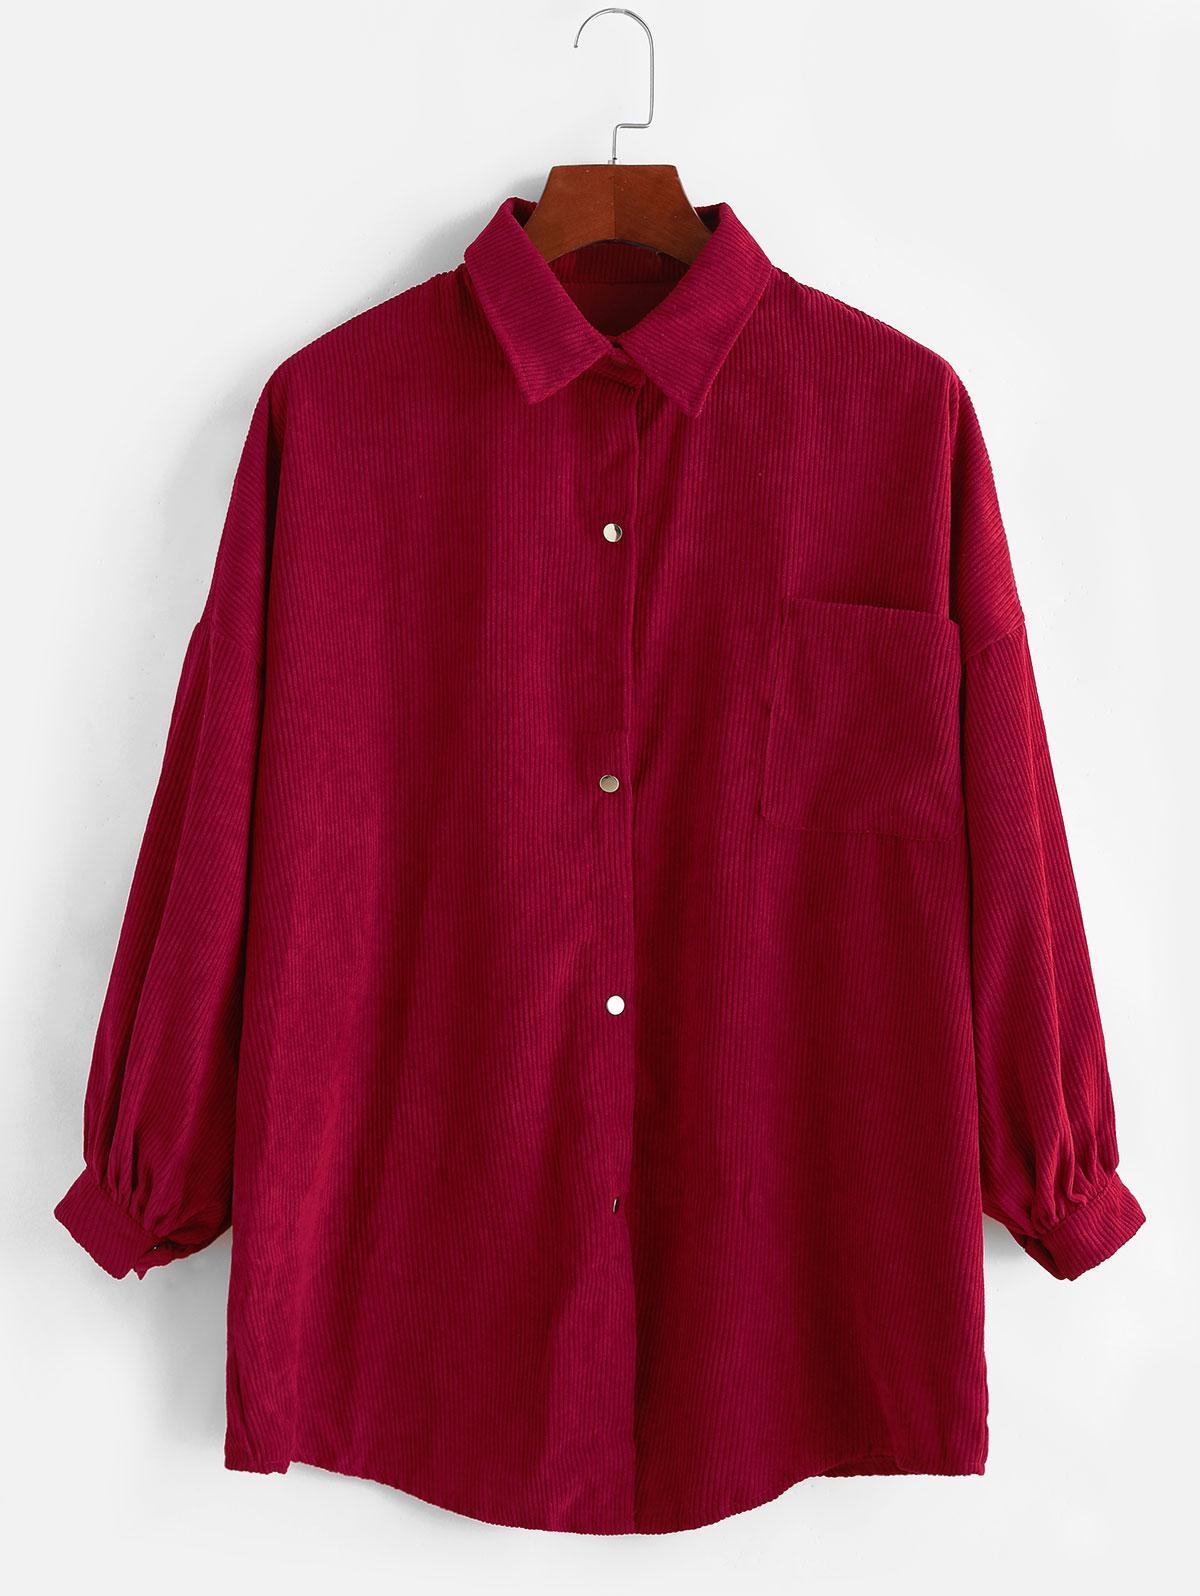 Snap Button Pocket Corduroy Boyfriend Shirt